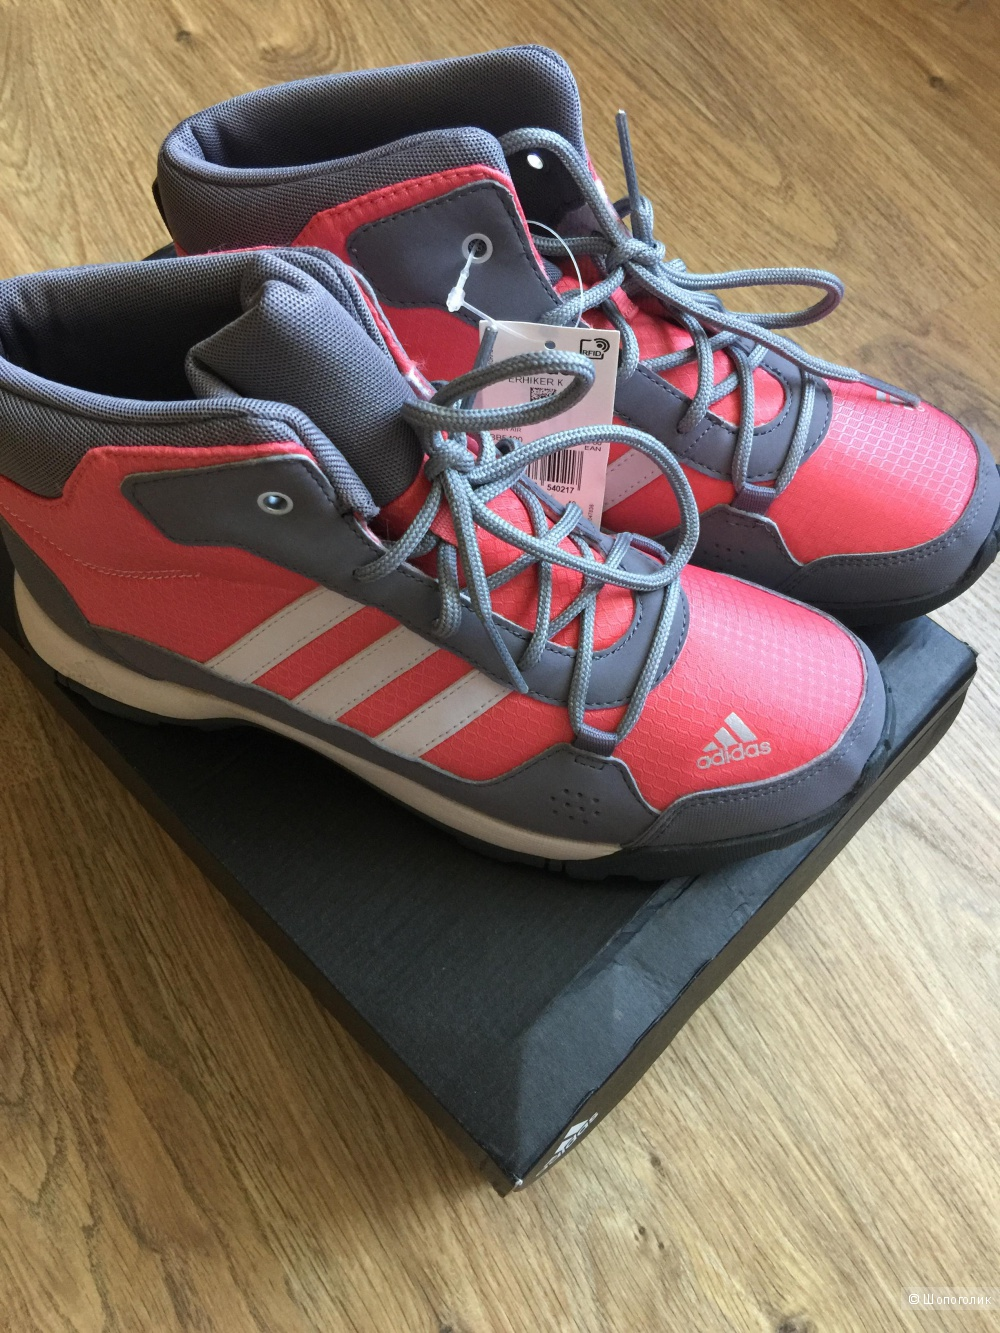 Утеплённые ботинки Adidas, размер 39-40